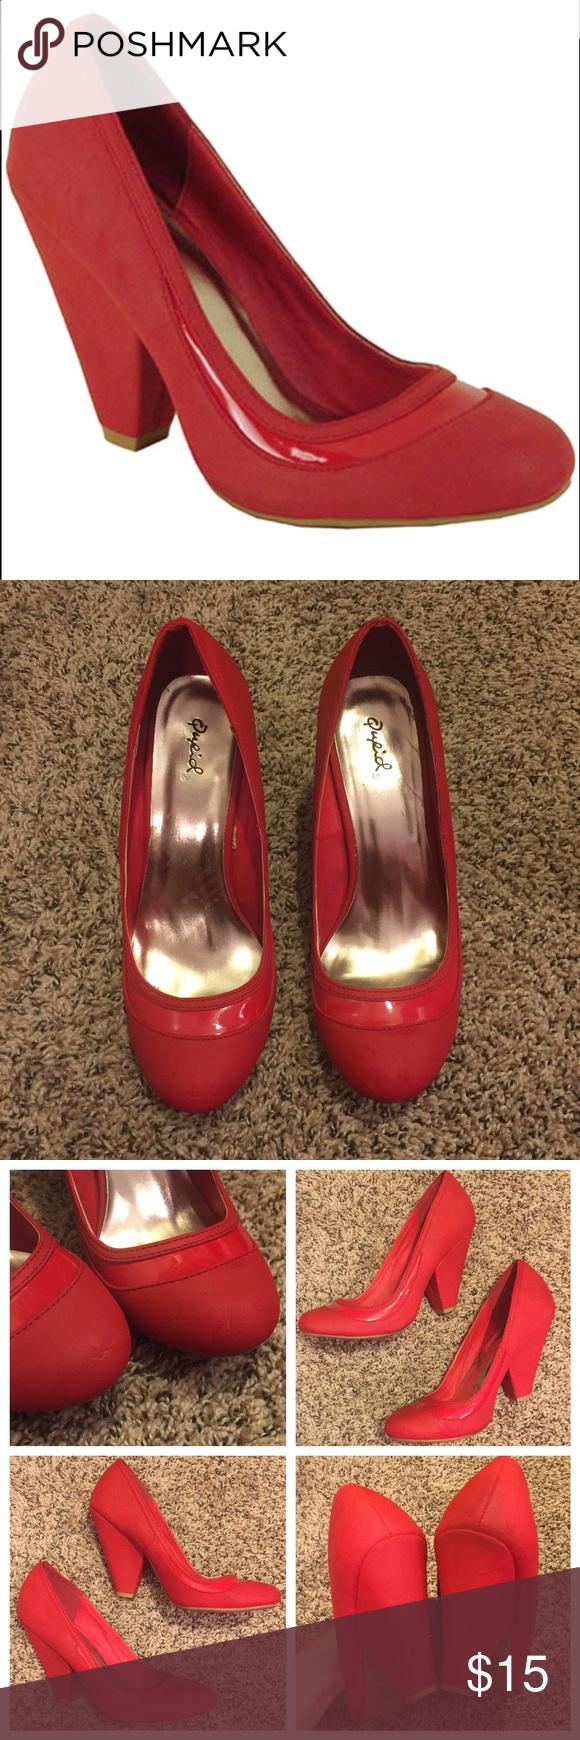 32a39e36c09b Sassy Red Heels Super cute red heels